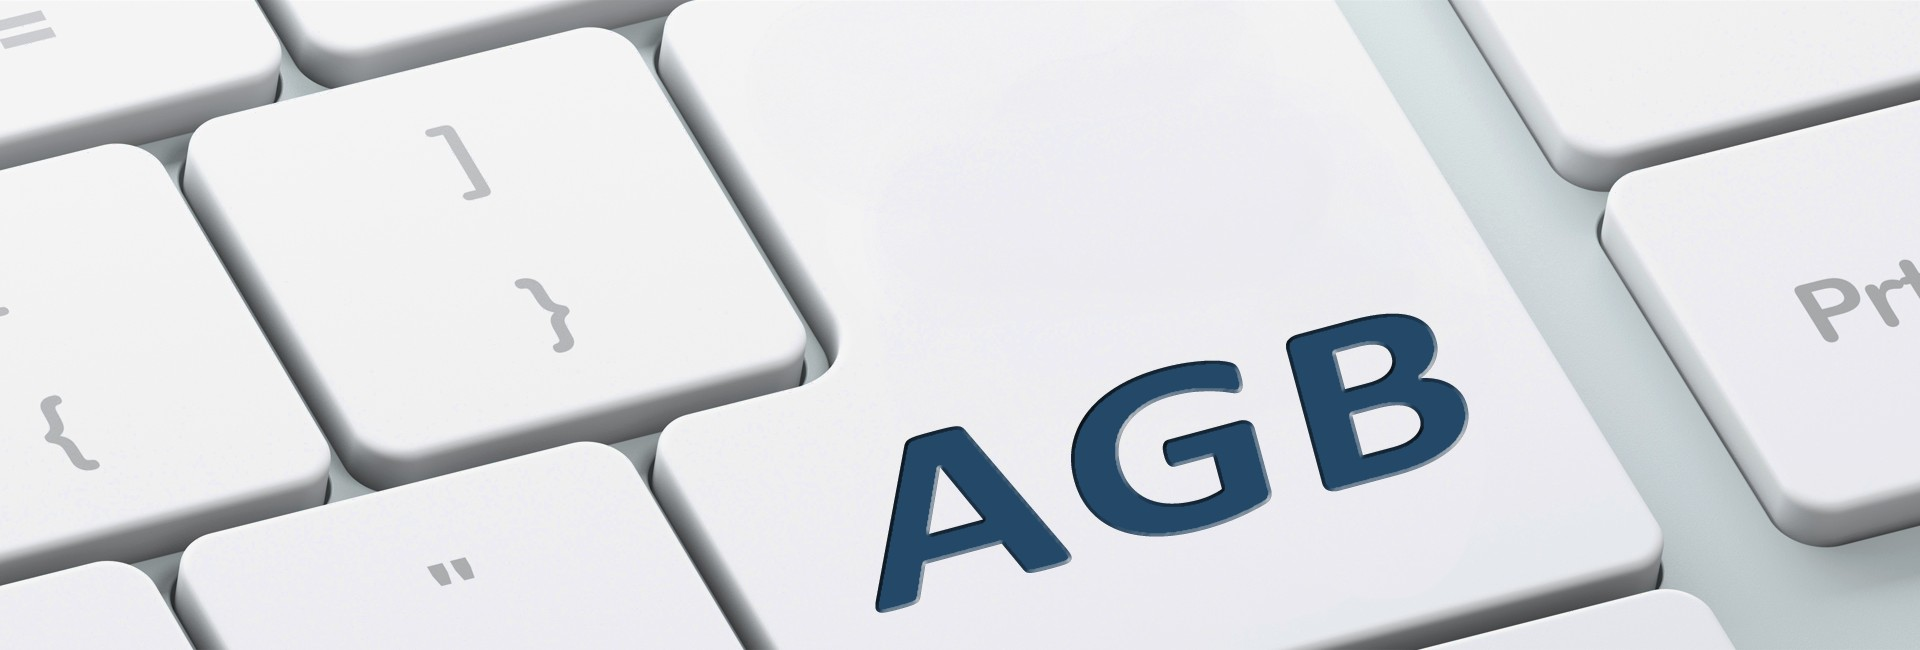 agb_1